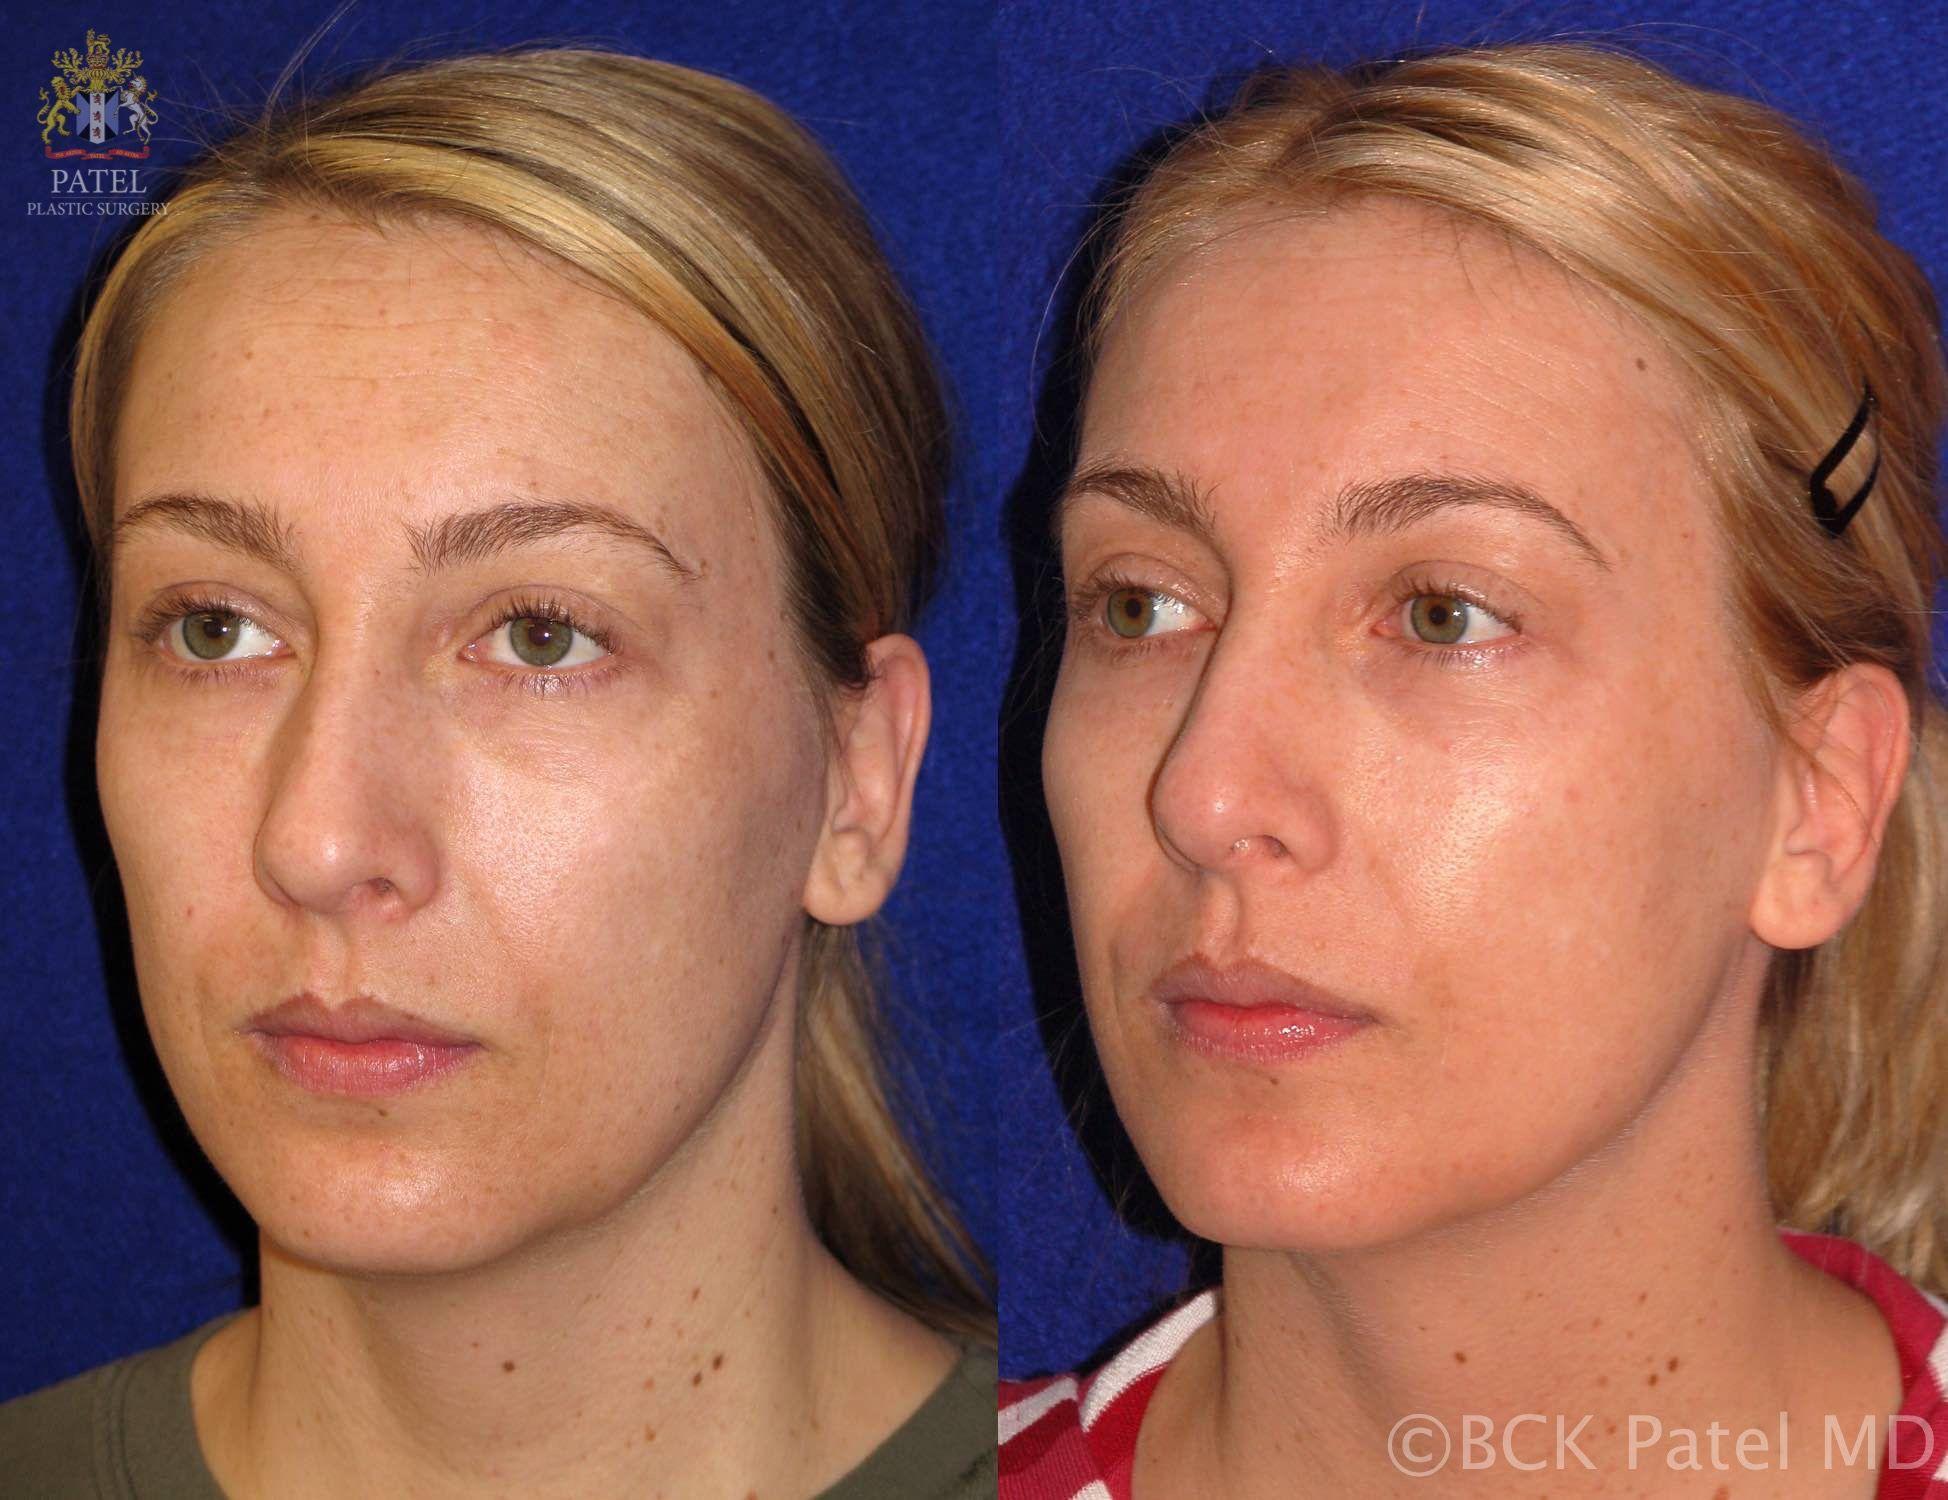 englishsurgeon.com. Results fo full face trichloroacetic acid chemical peels by Dr BCK Patel MD, FRCS, Salt Lake City, Utah, St George, London